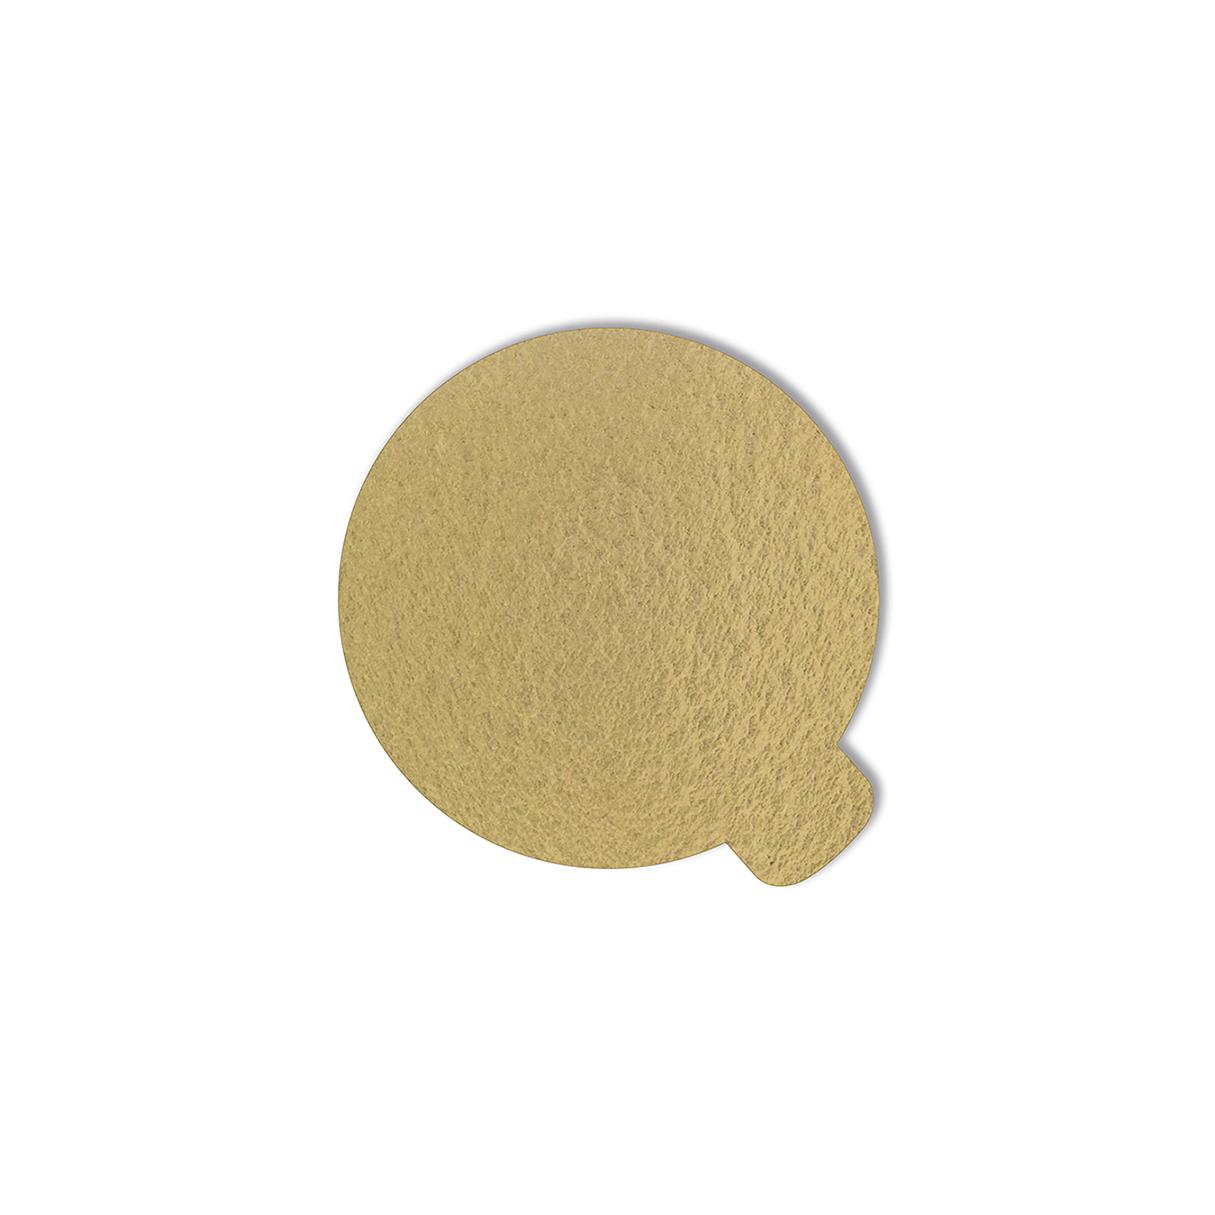 100 Bases Laminadas, Suporte P/ Doces de 7,5 cm - Ouro